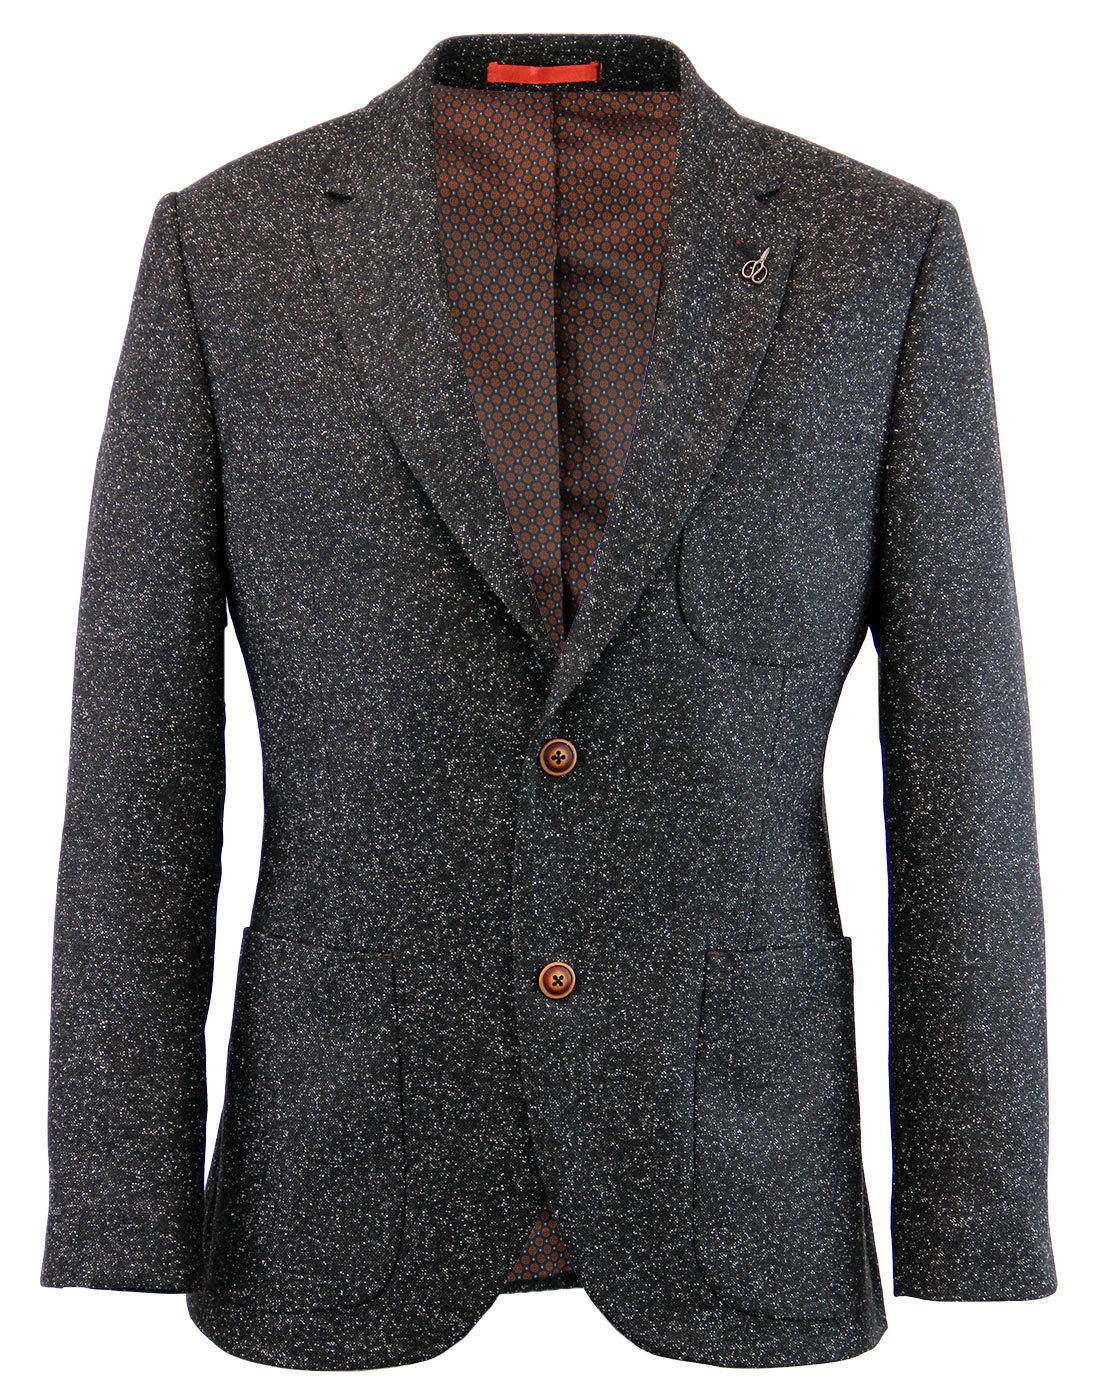 GIBSON LONDON Mod 2 Button Donegal Suit Jacket (C)